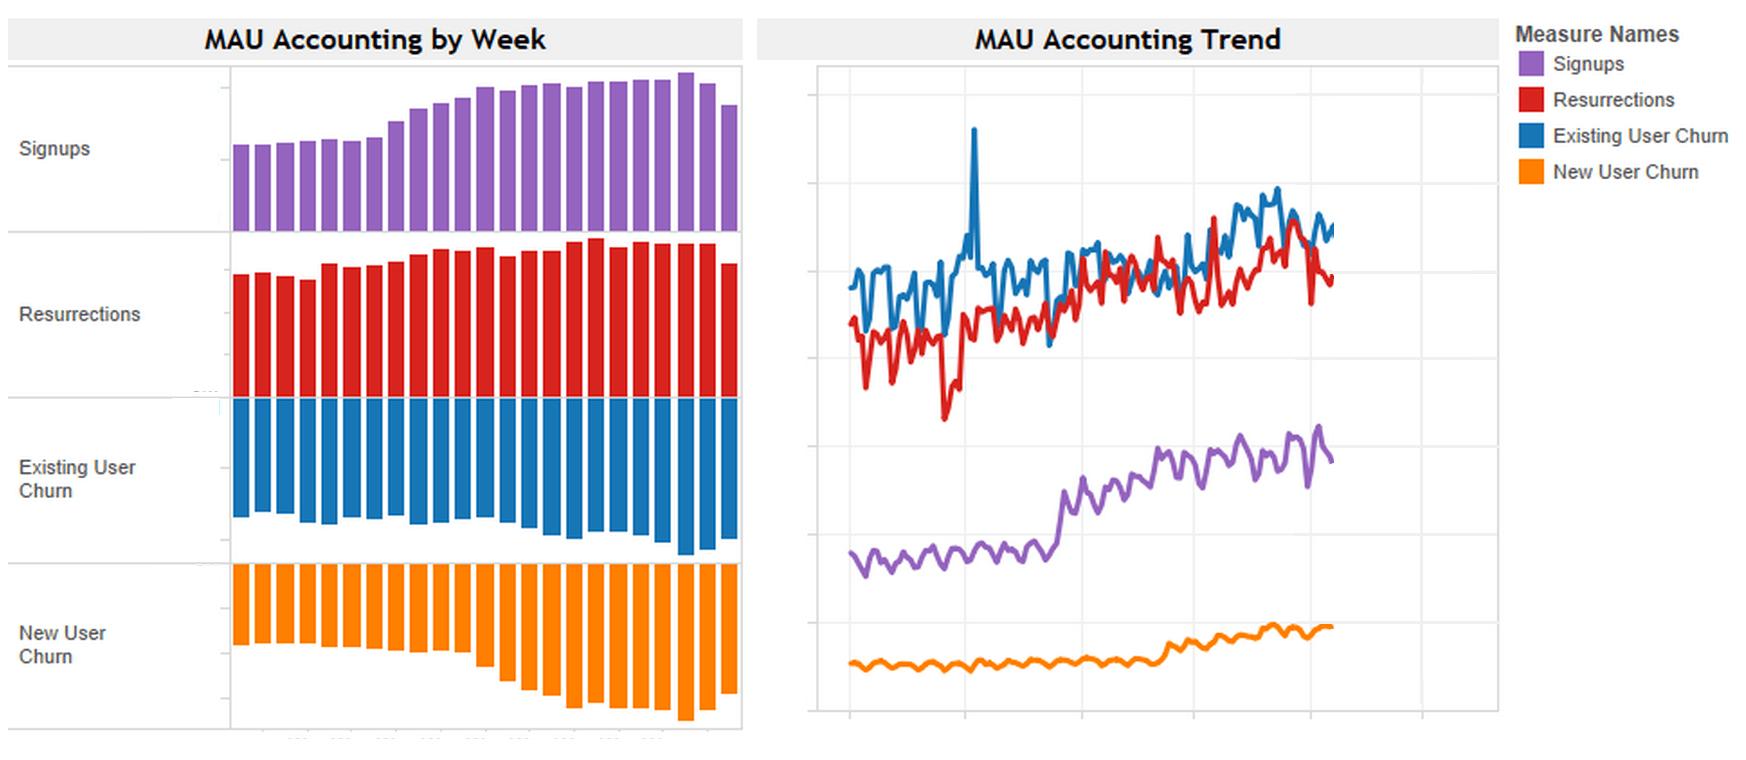 Growth MAU Accounting